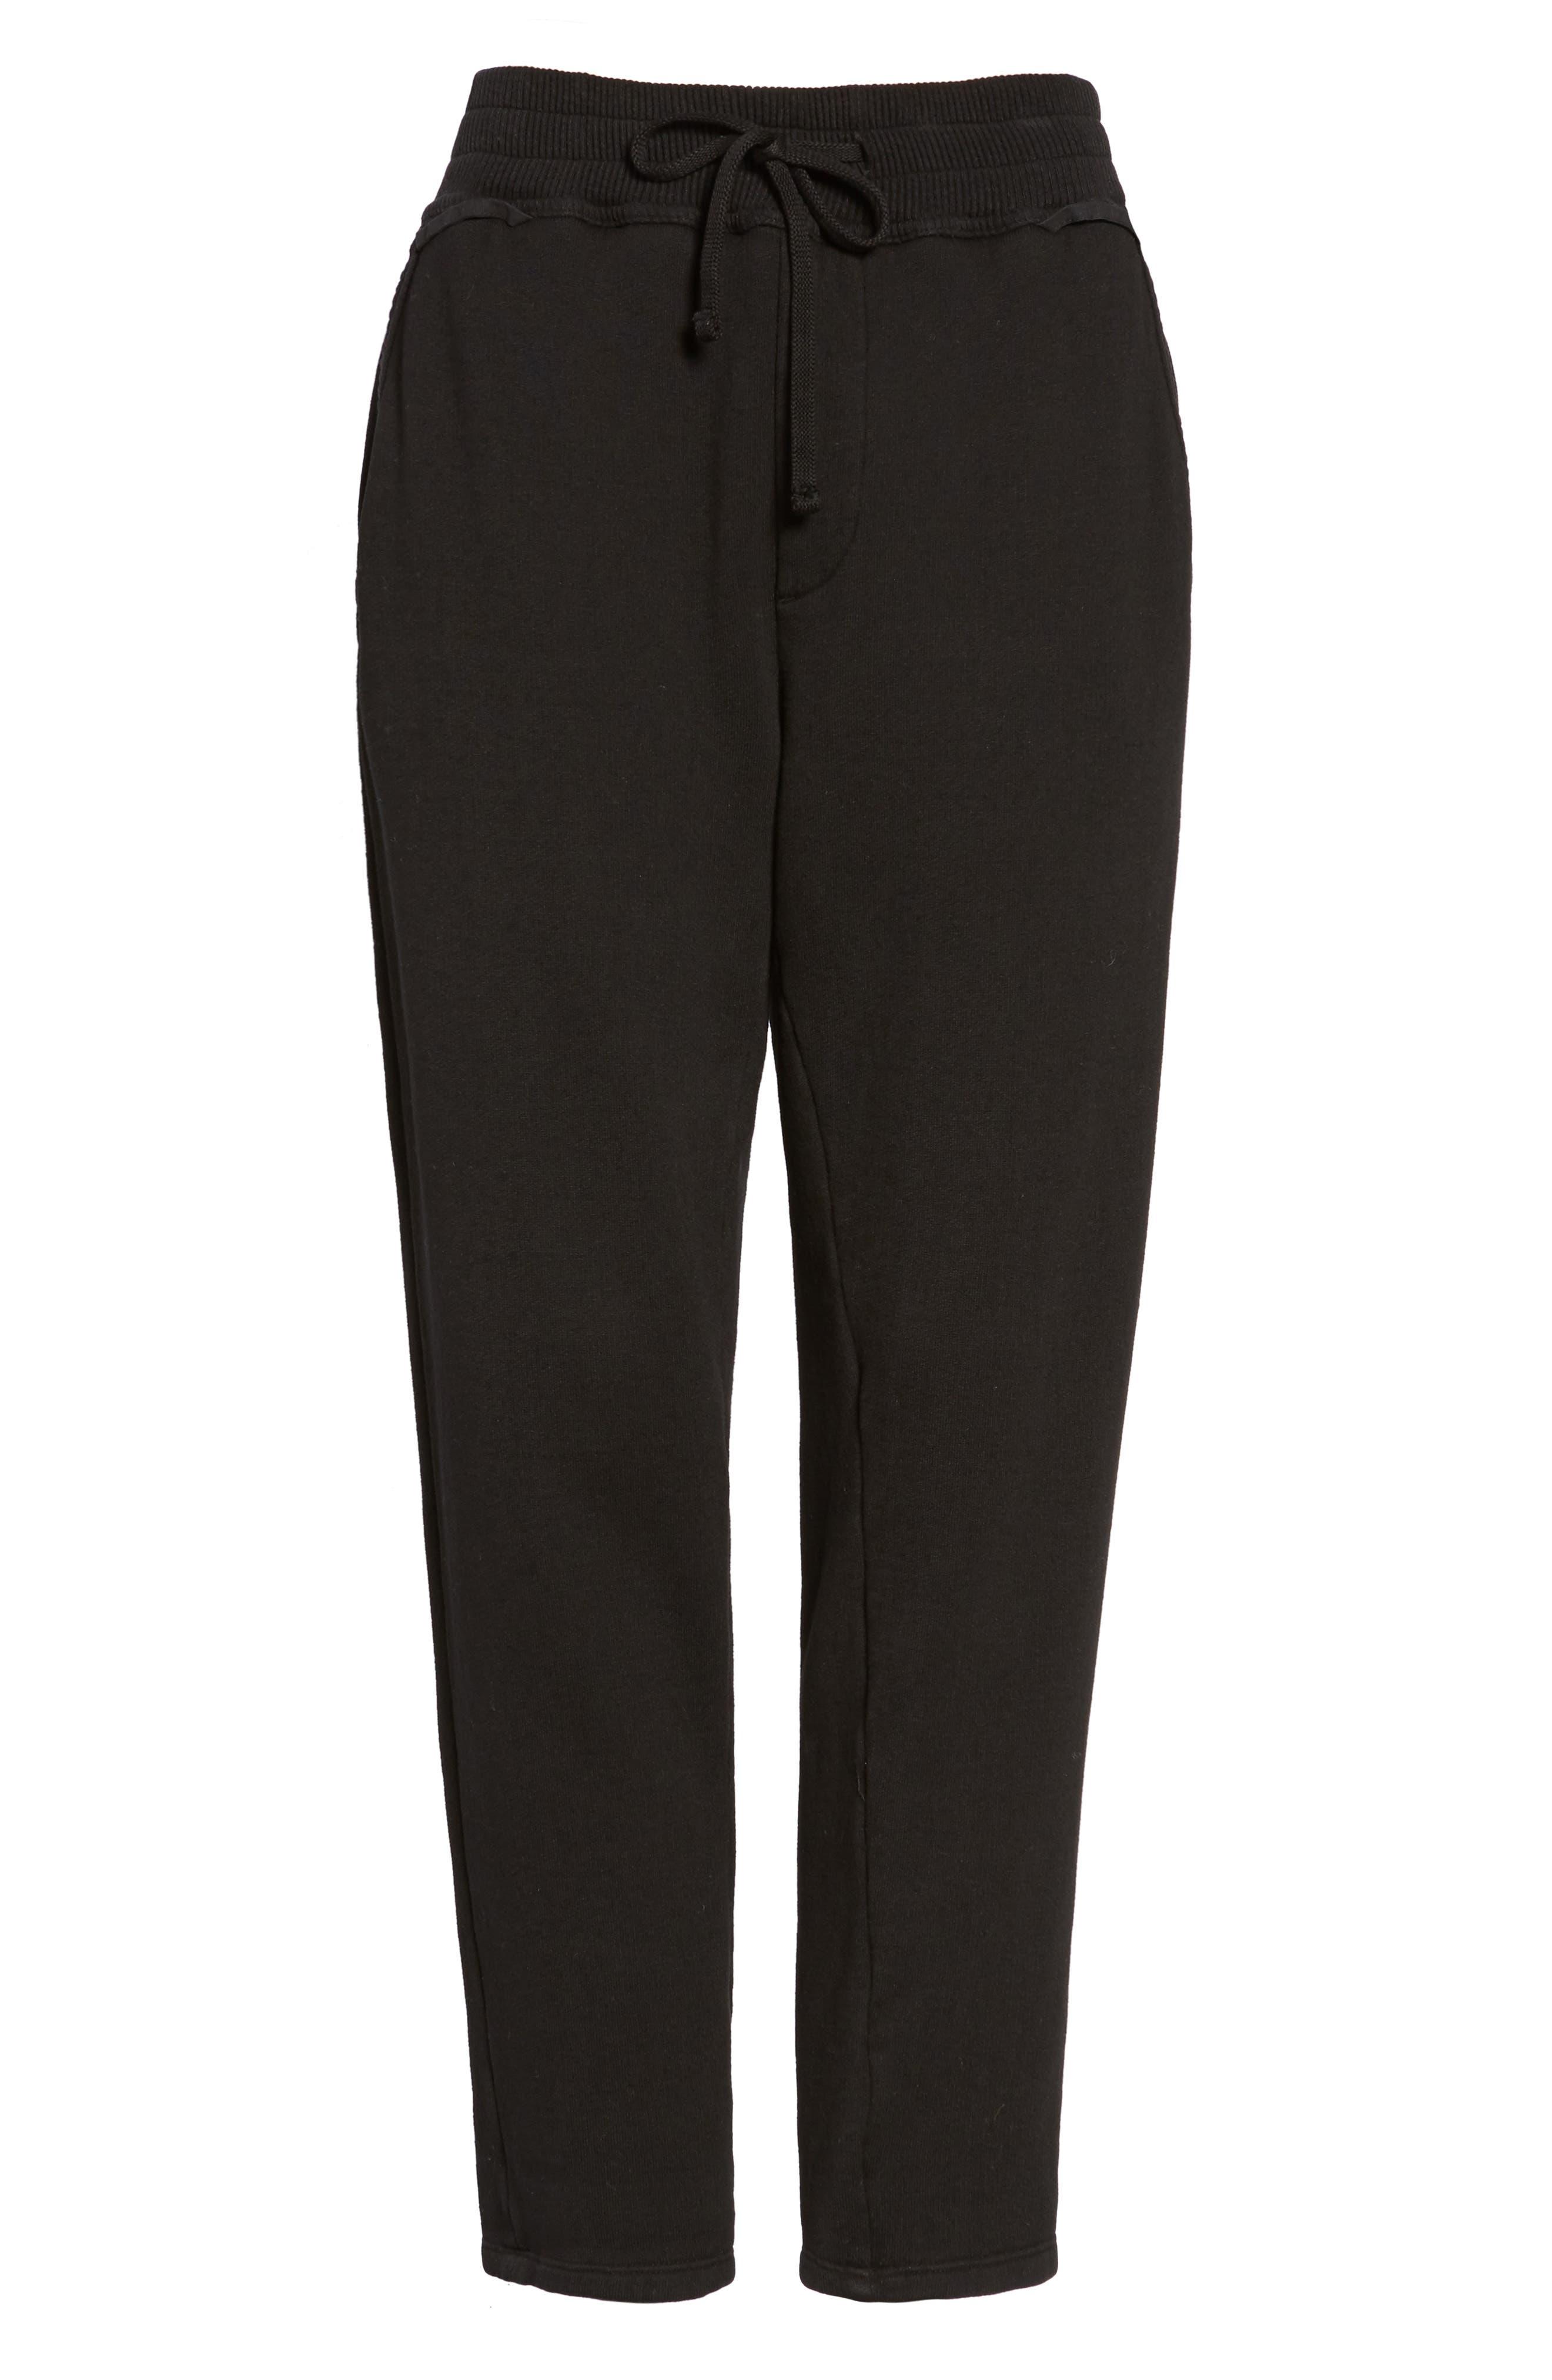 Terry Lounge Pants,                             Alternate thumbnail 5, color,                             Black